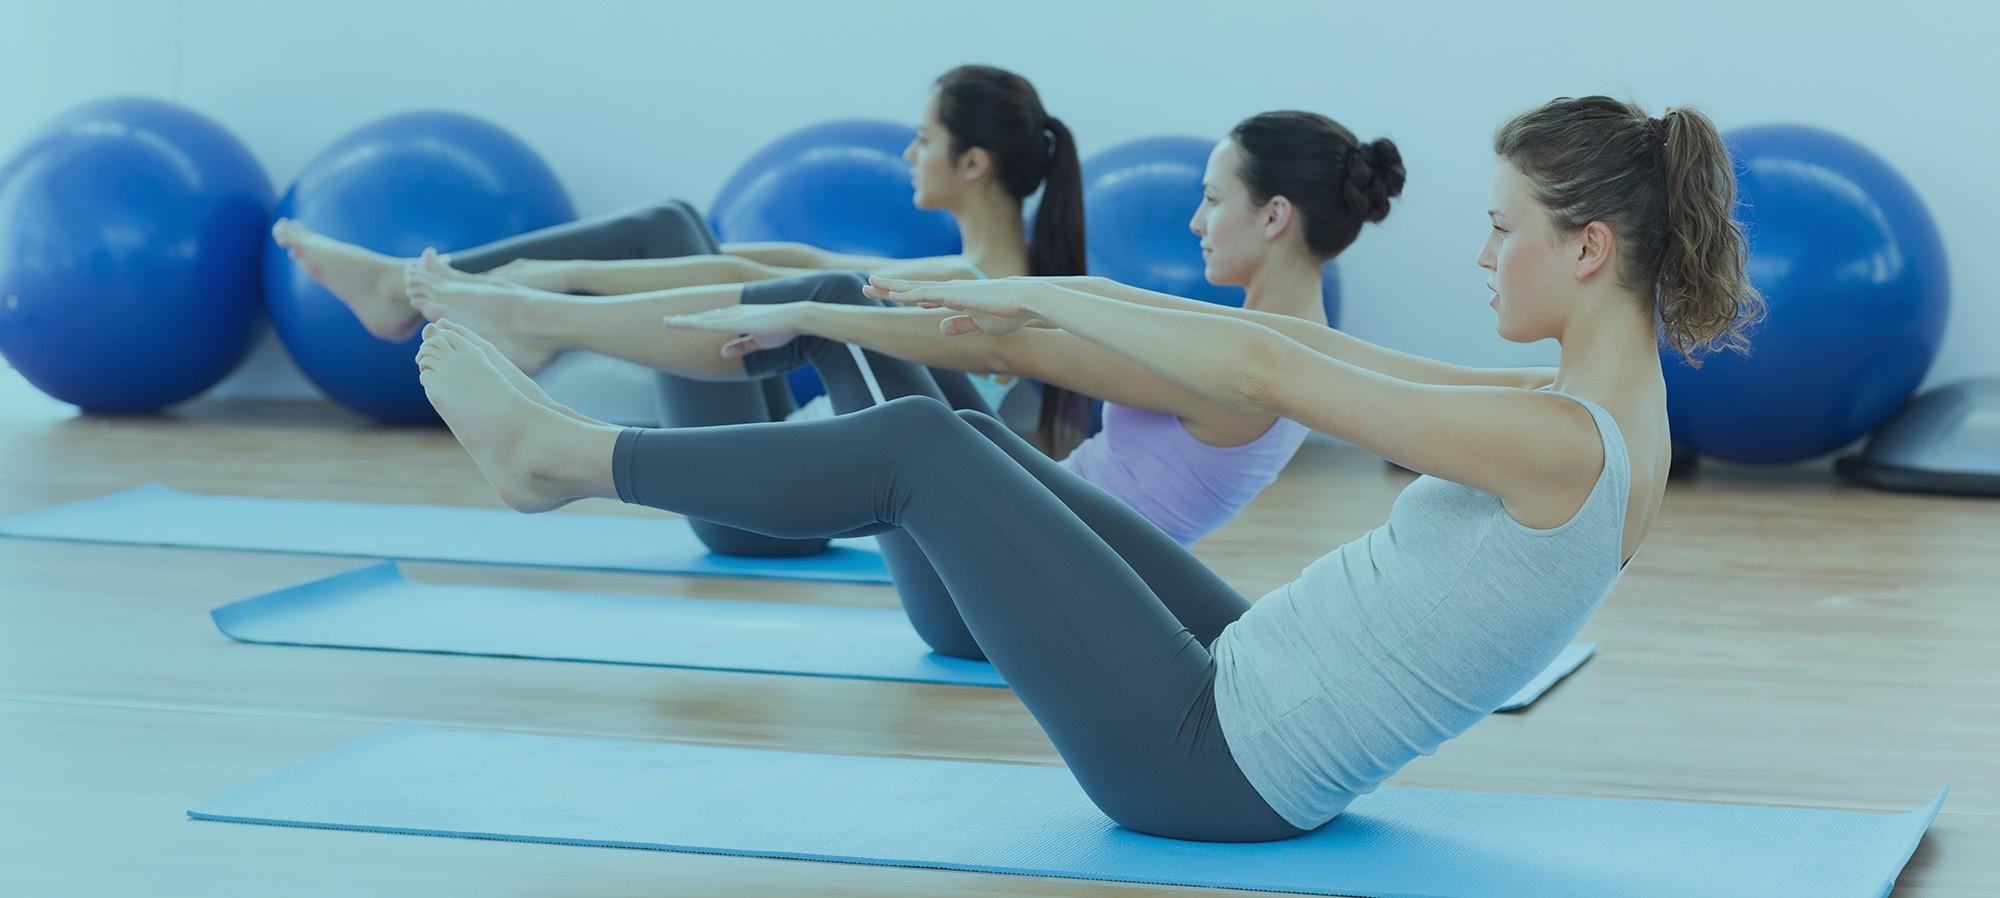 S.T.O.T.T. Pilates Class Sligo | Complete Body Movement